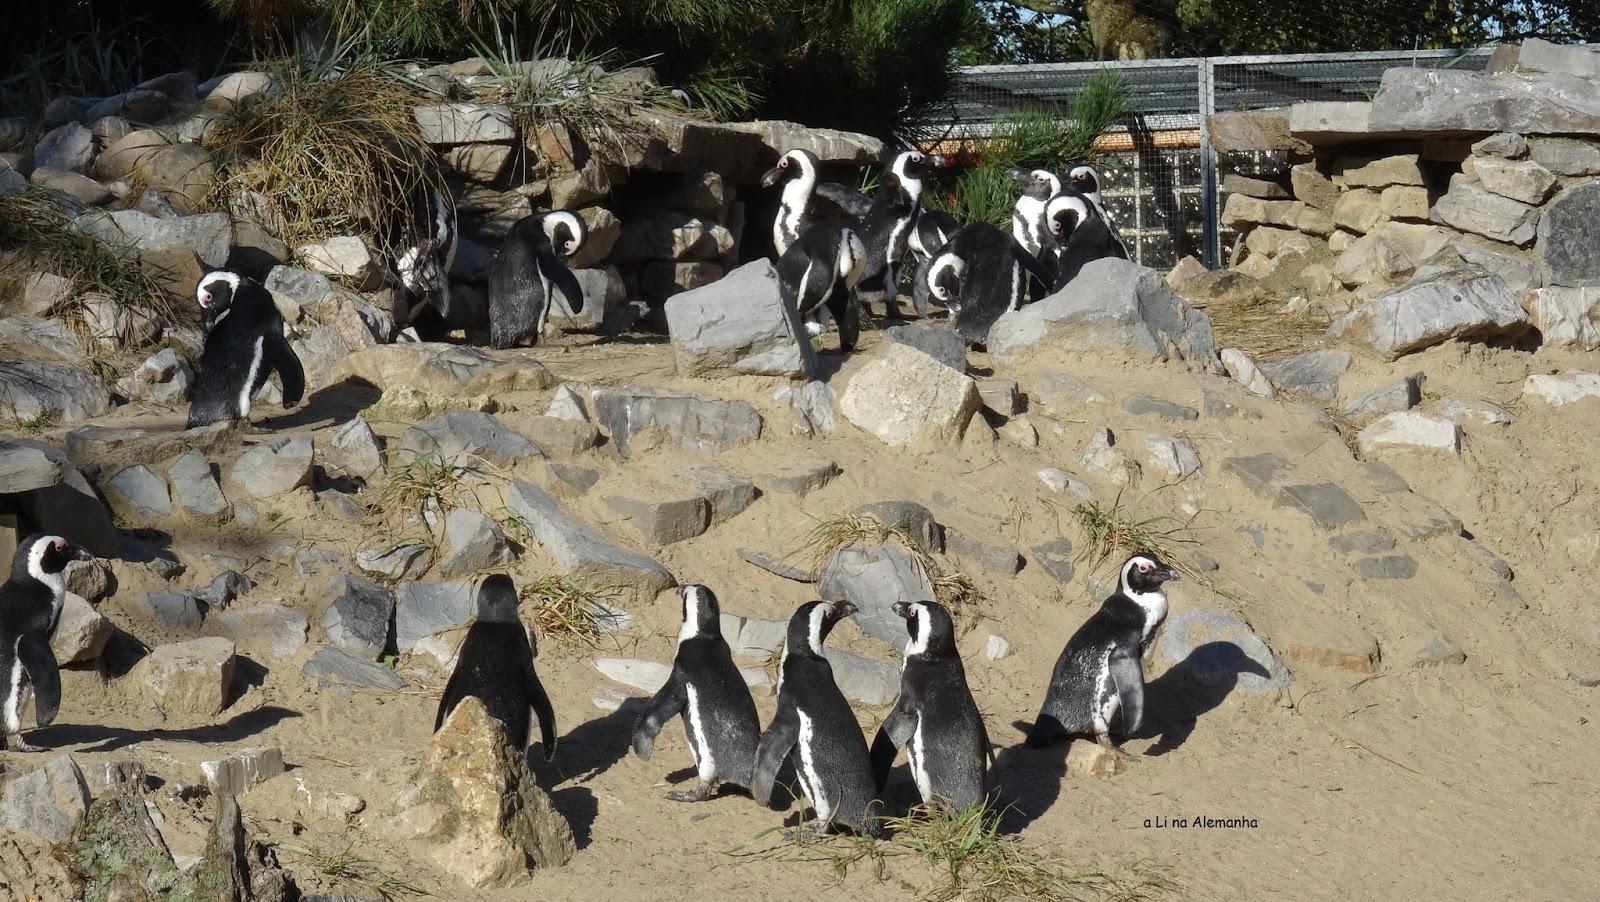 Zoológico em Aachen